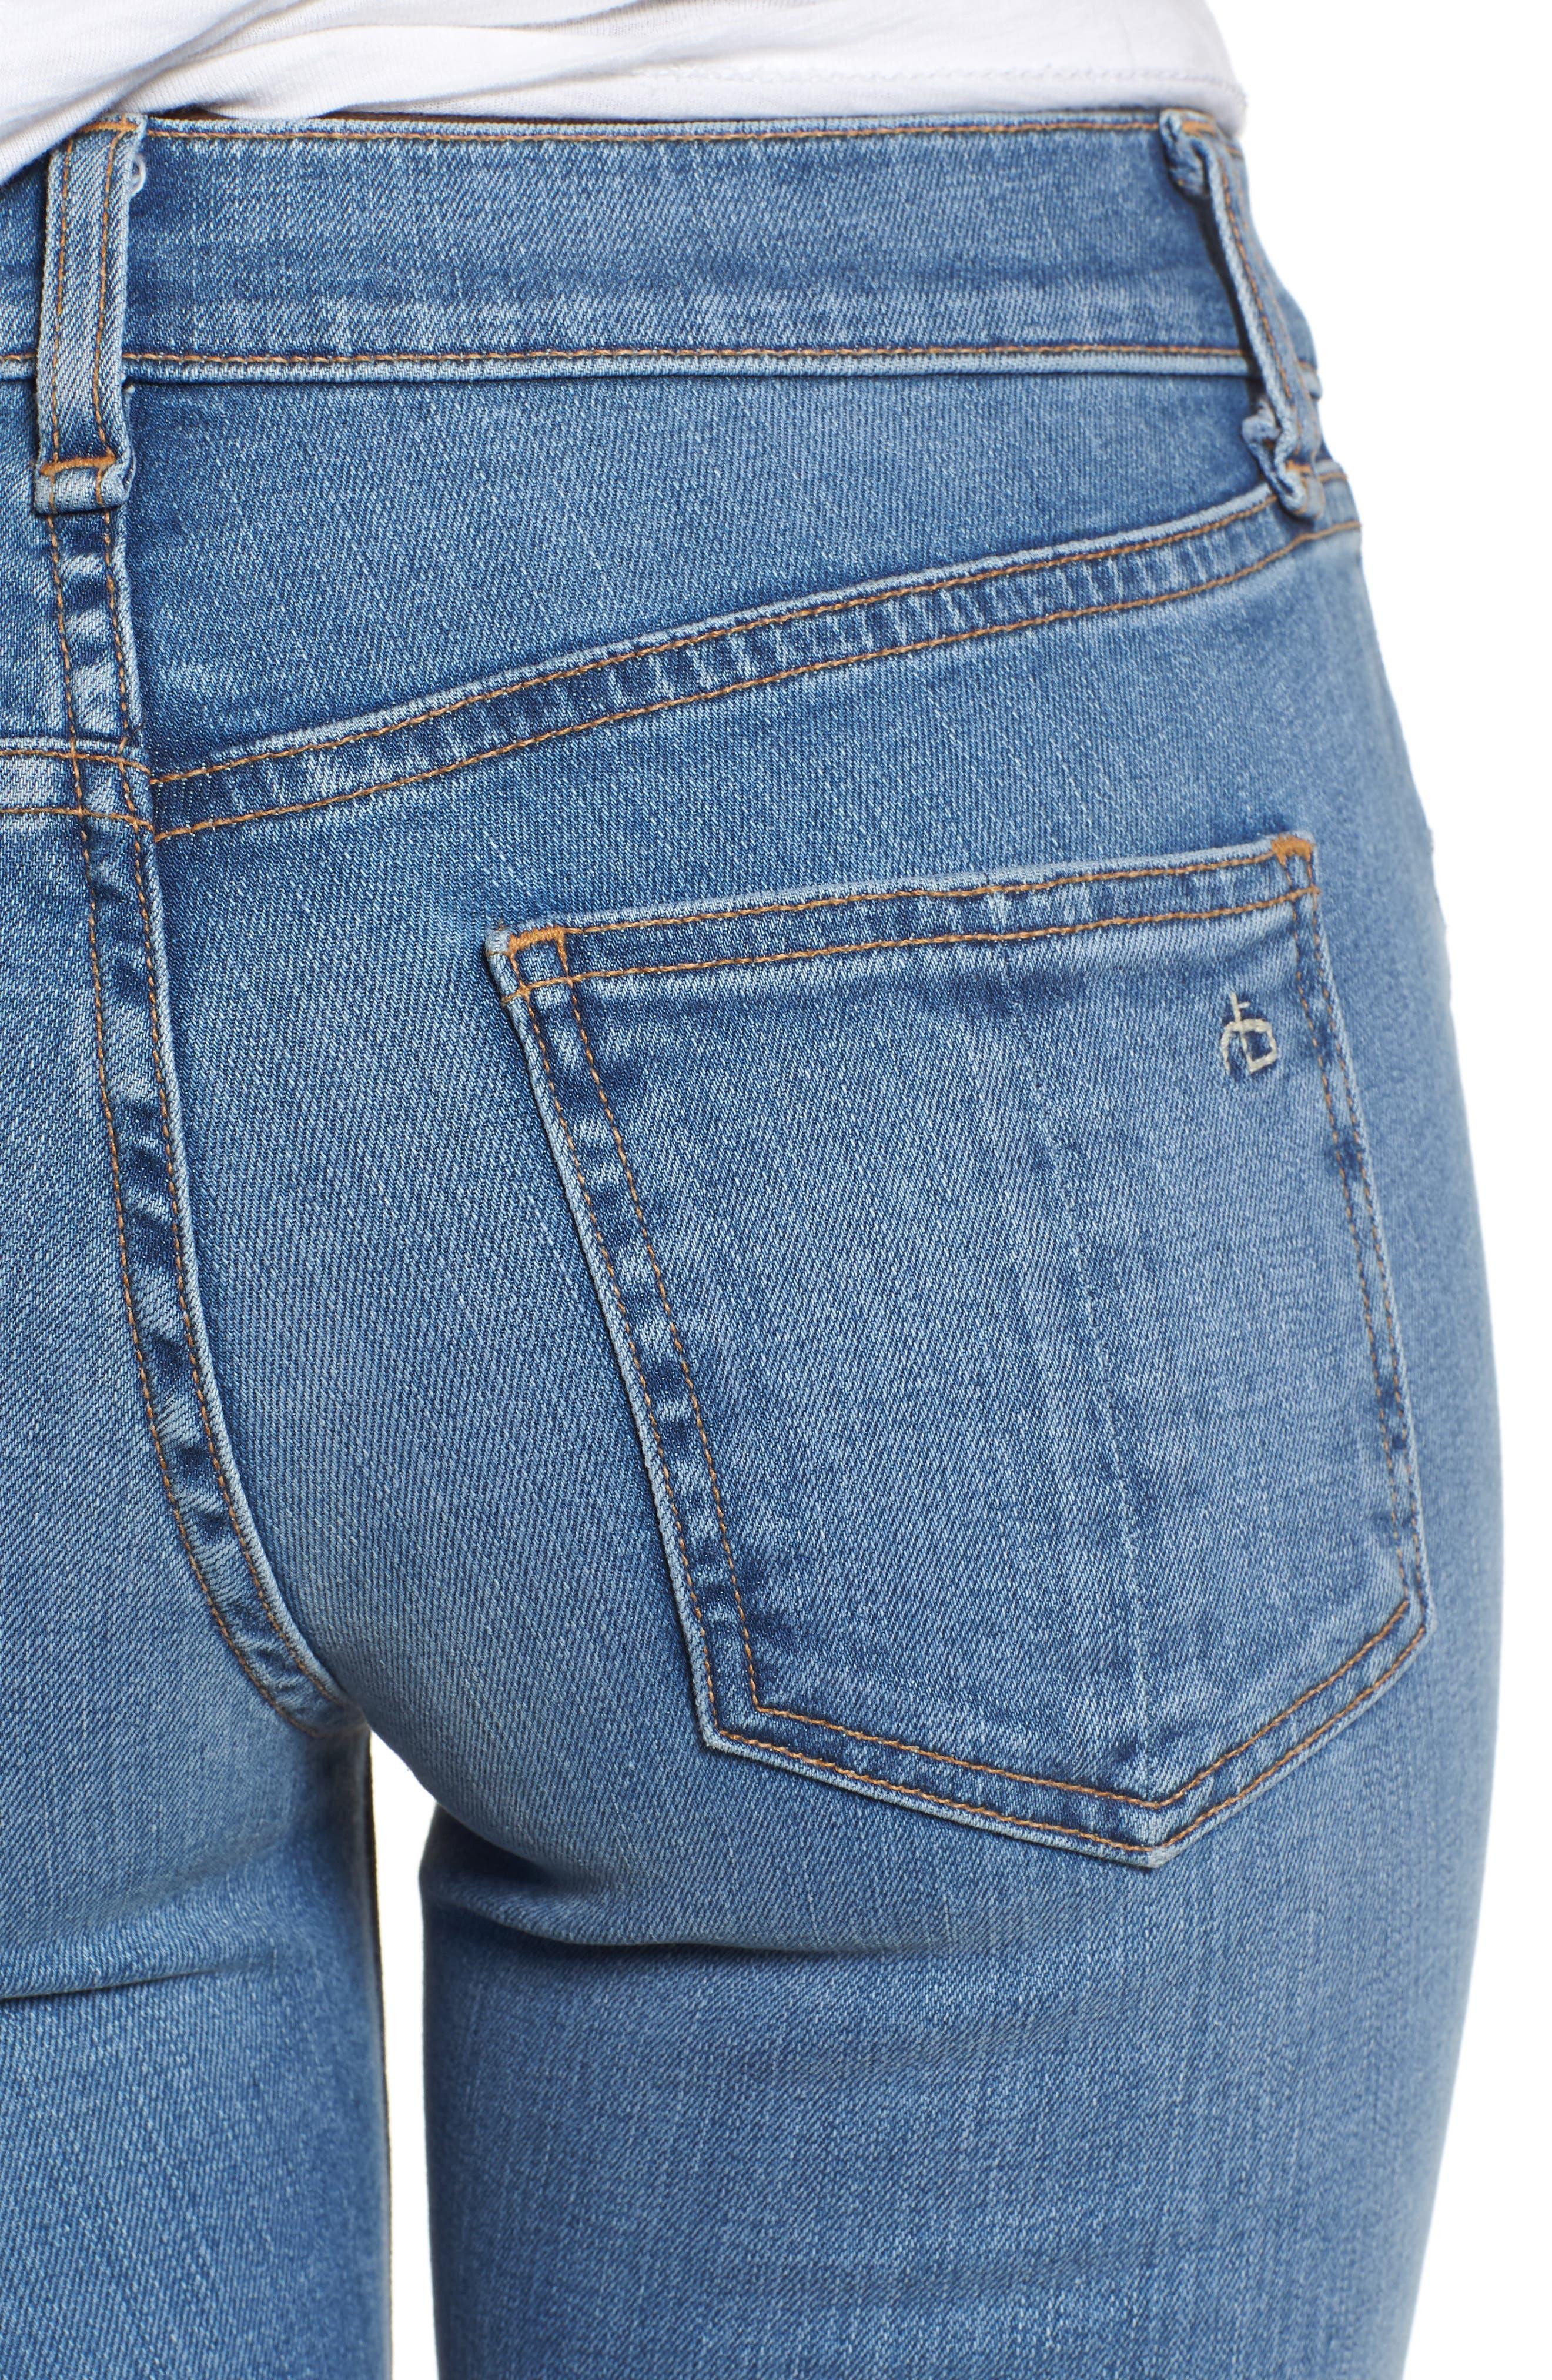 Crop Skinny Jeans,                             Alternate thumbnail 4, color,                             424